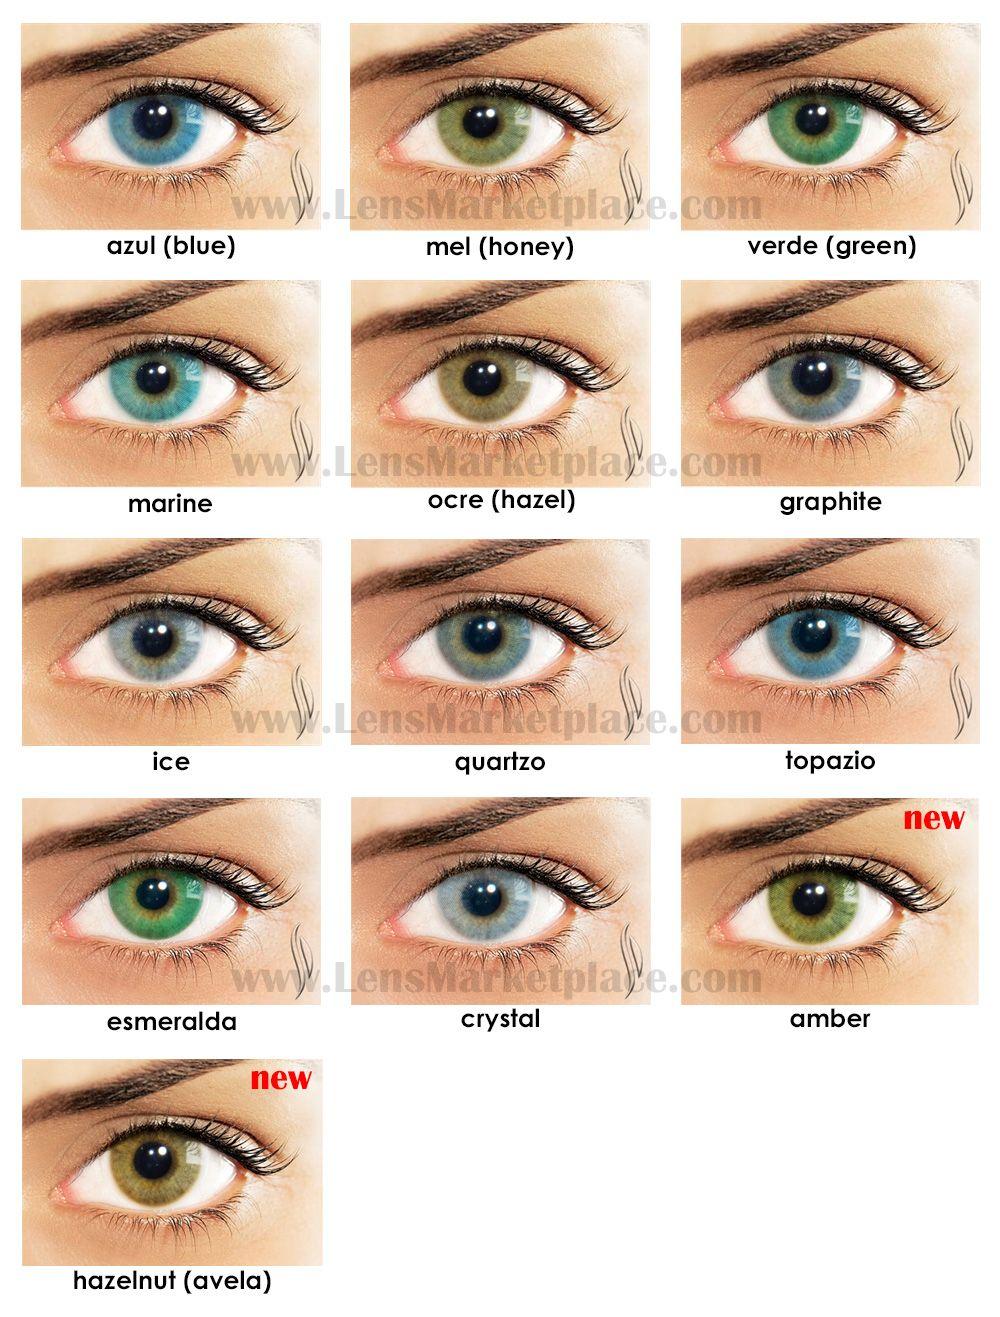 LIZ Eye Color Contact Lenses - 20 Colors | Color contacts, Eye ...